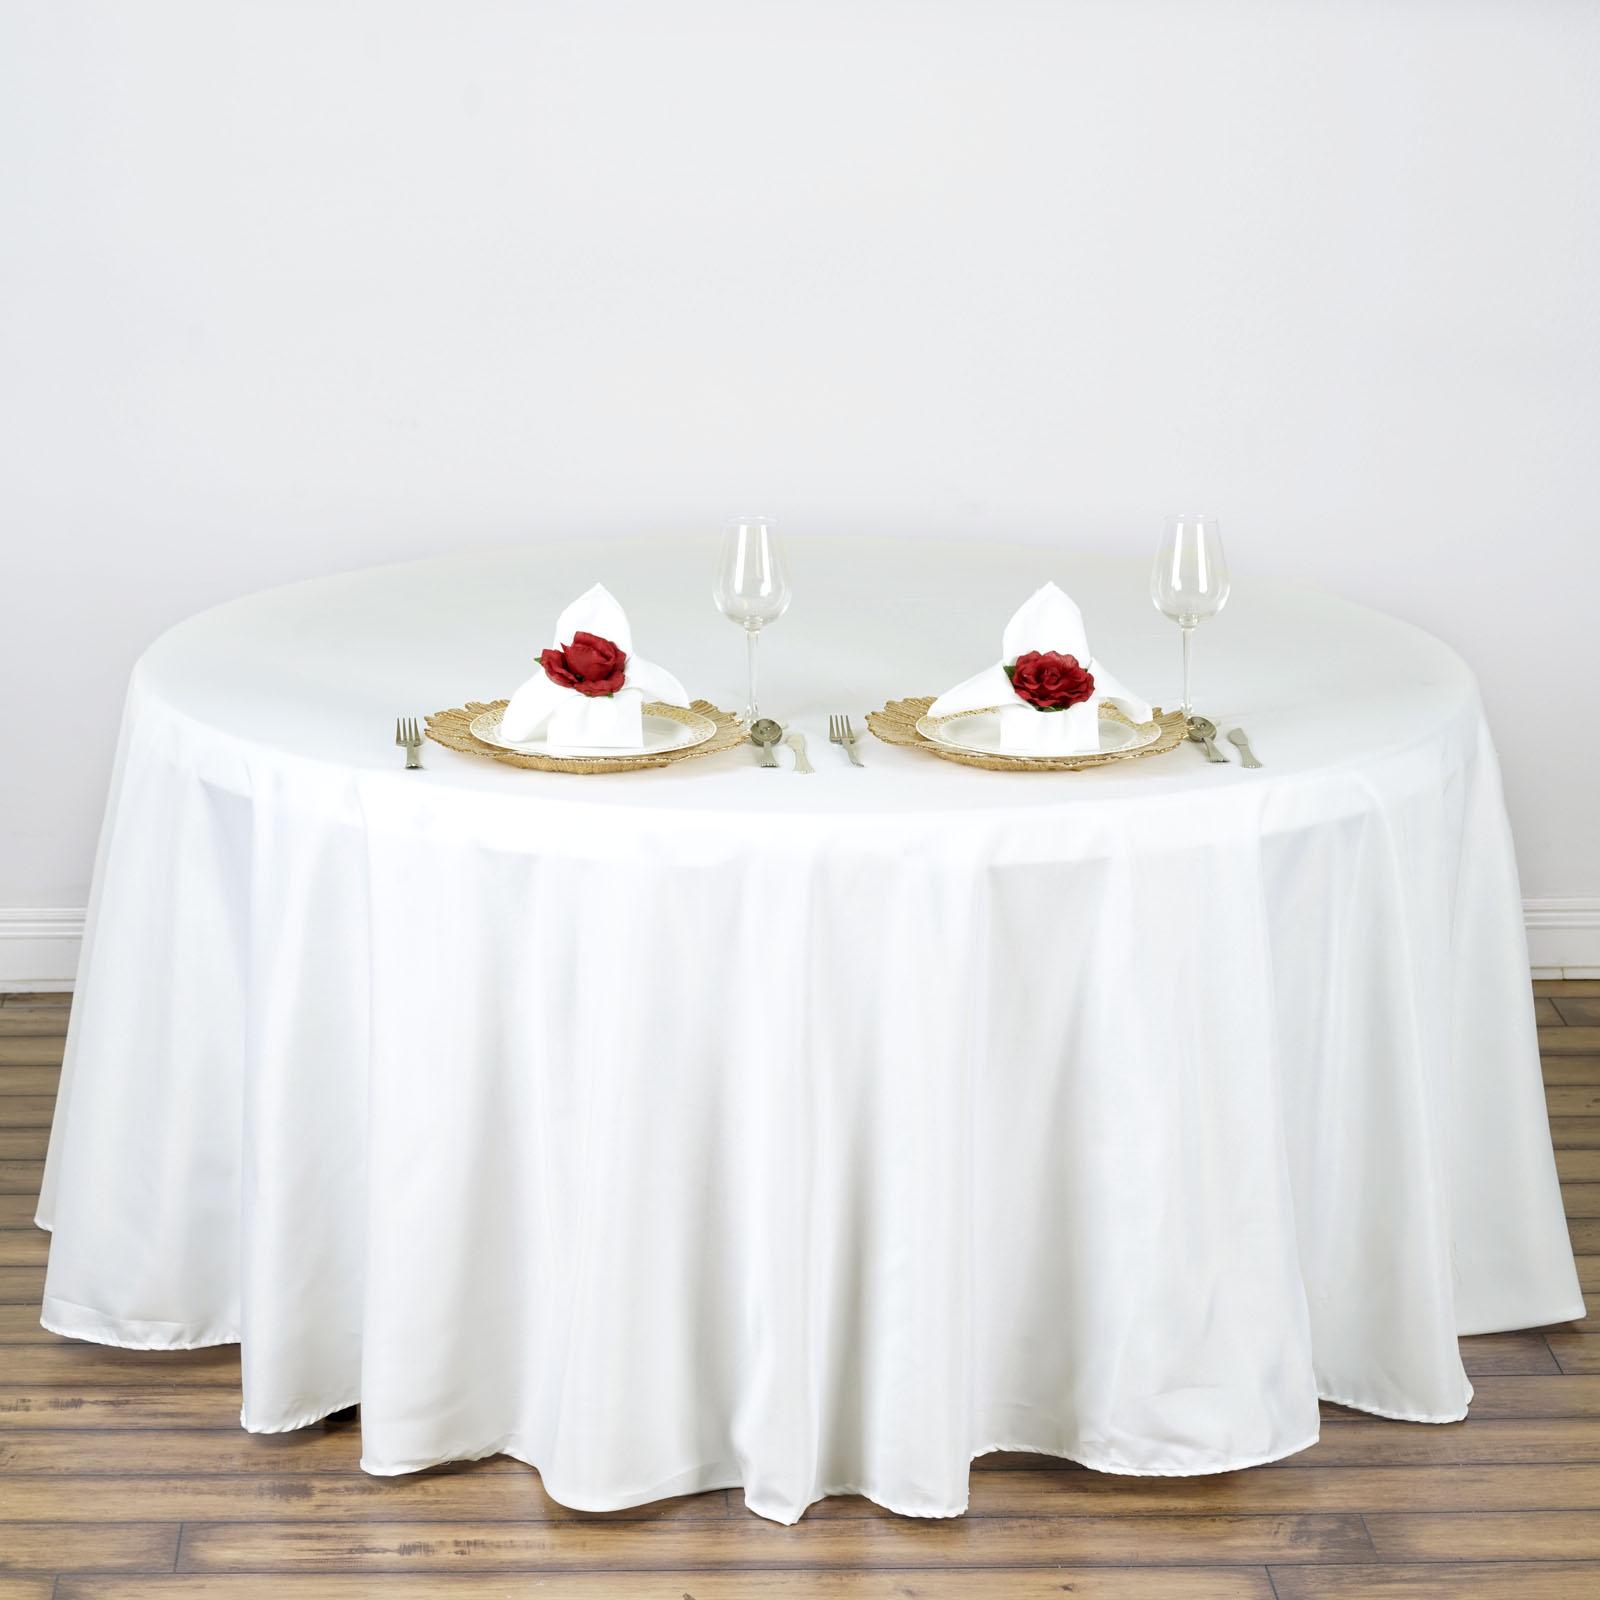 Ebay Tablecloths Round